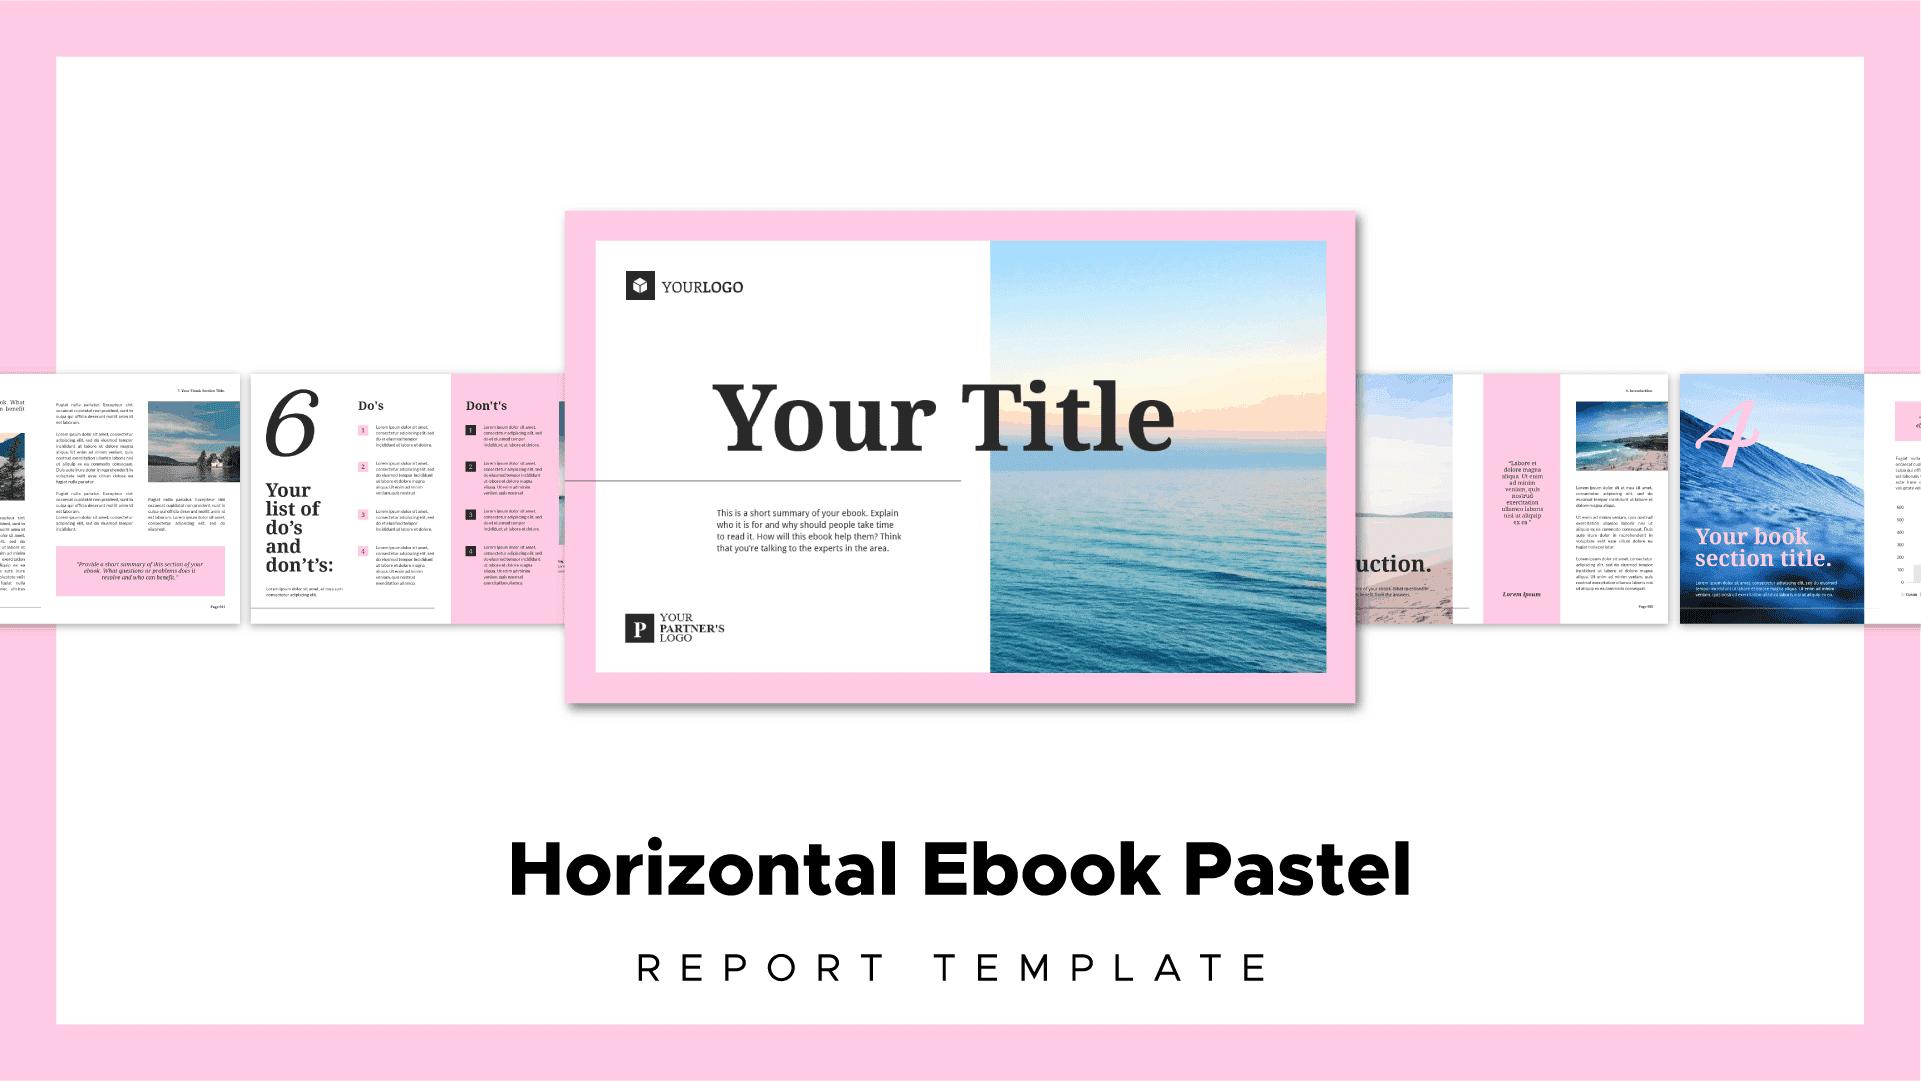 templates-visual_report_1214-1-5026828